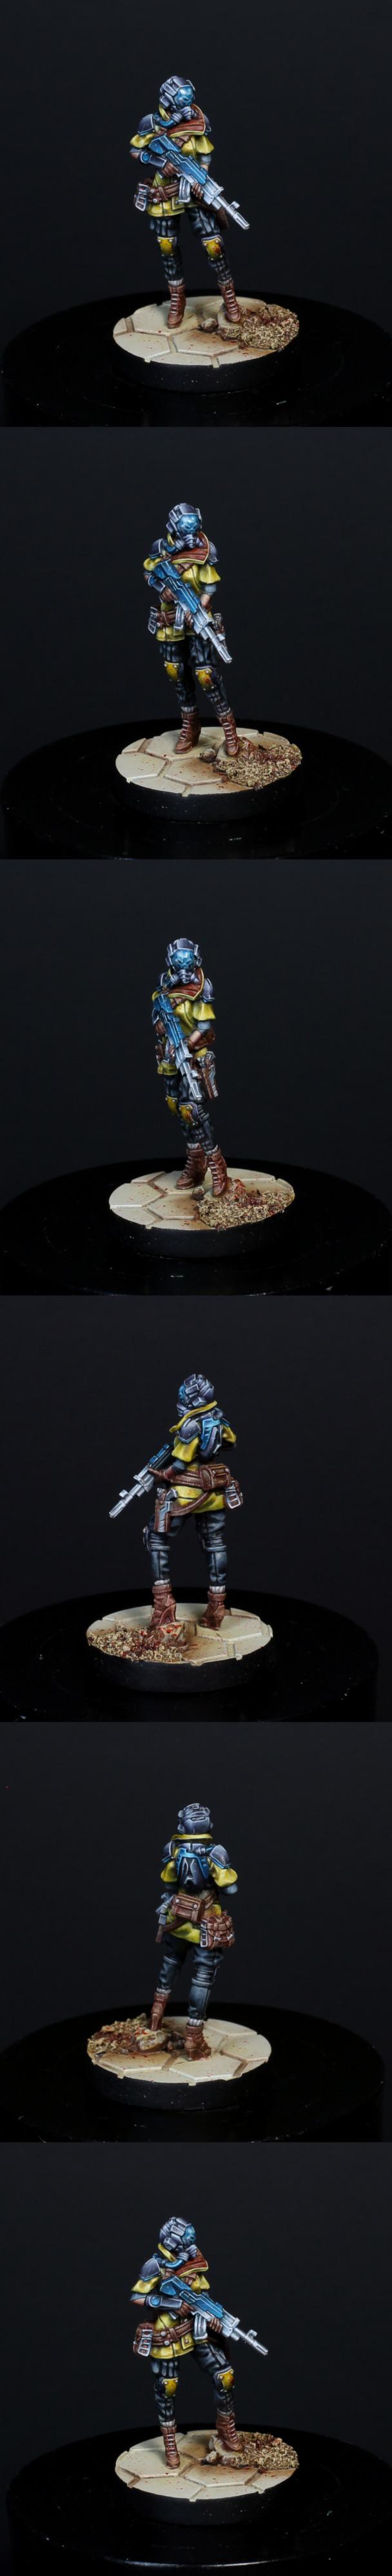 Infinity Mercenary Brawler